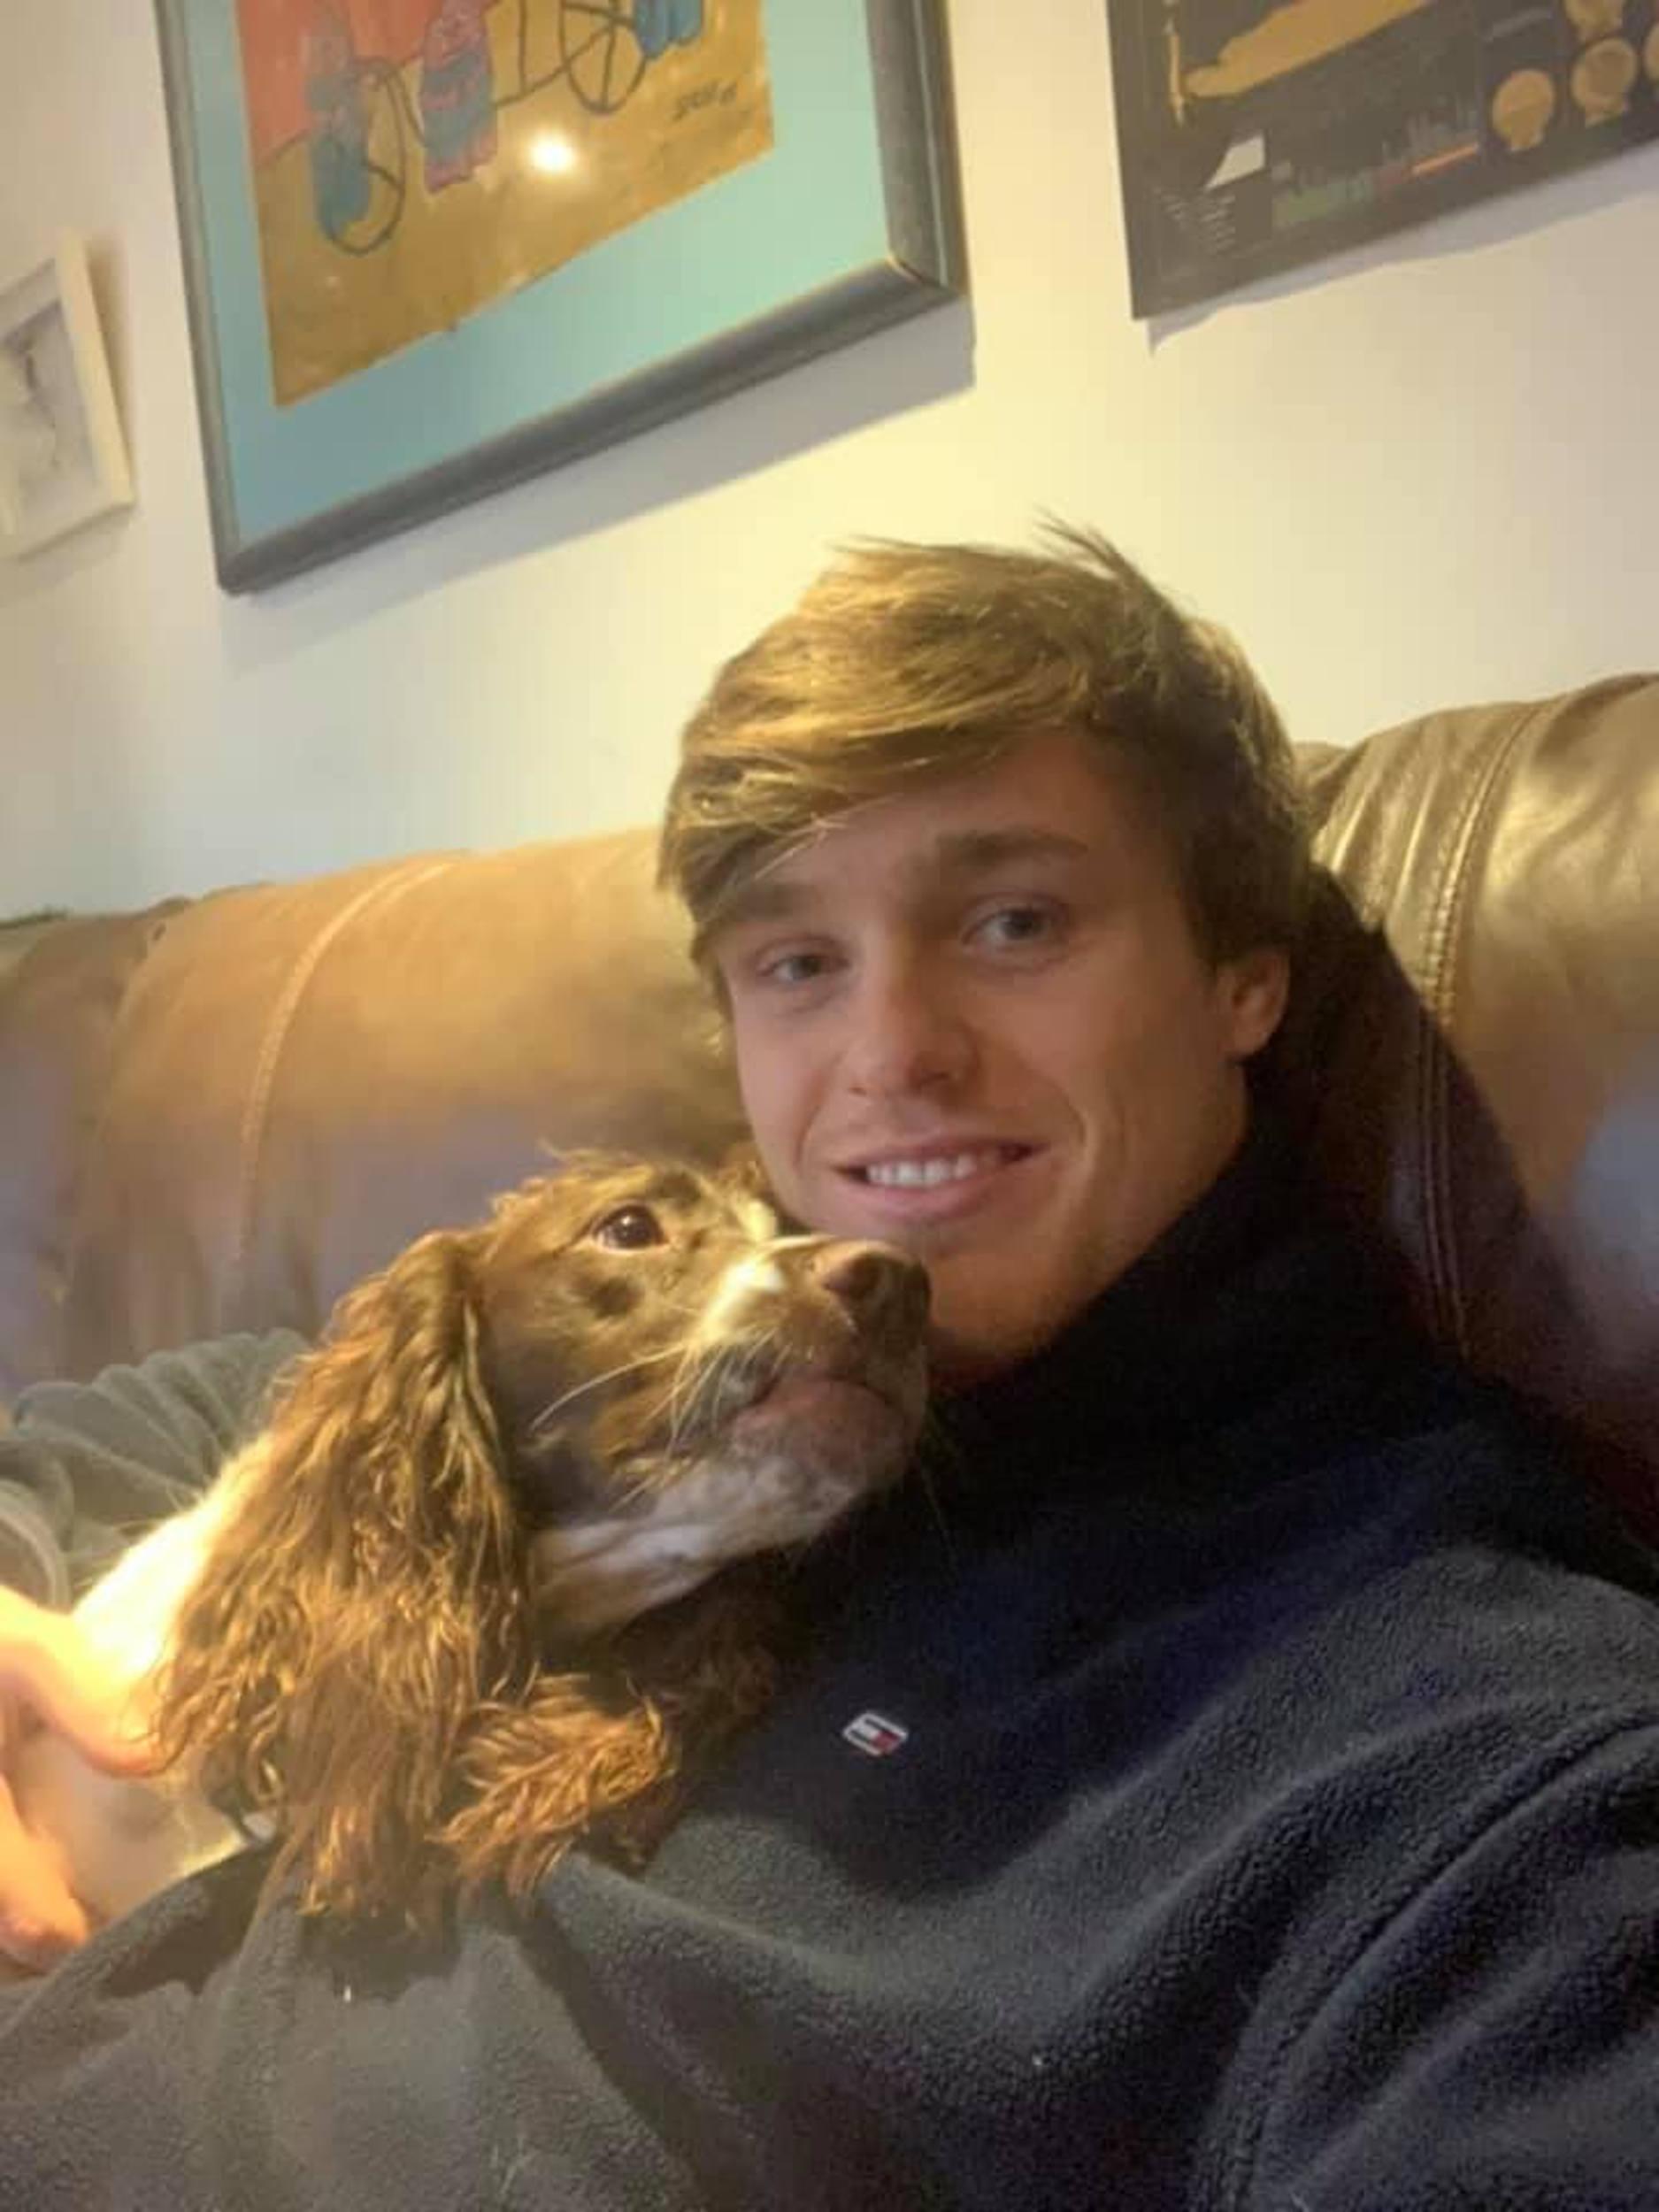 Dog saved by CPR - Animal News